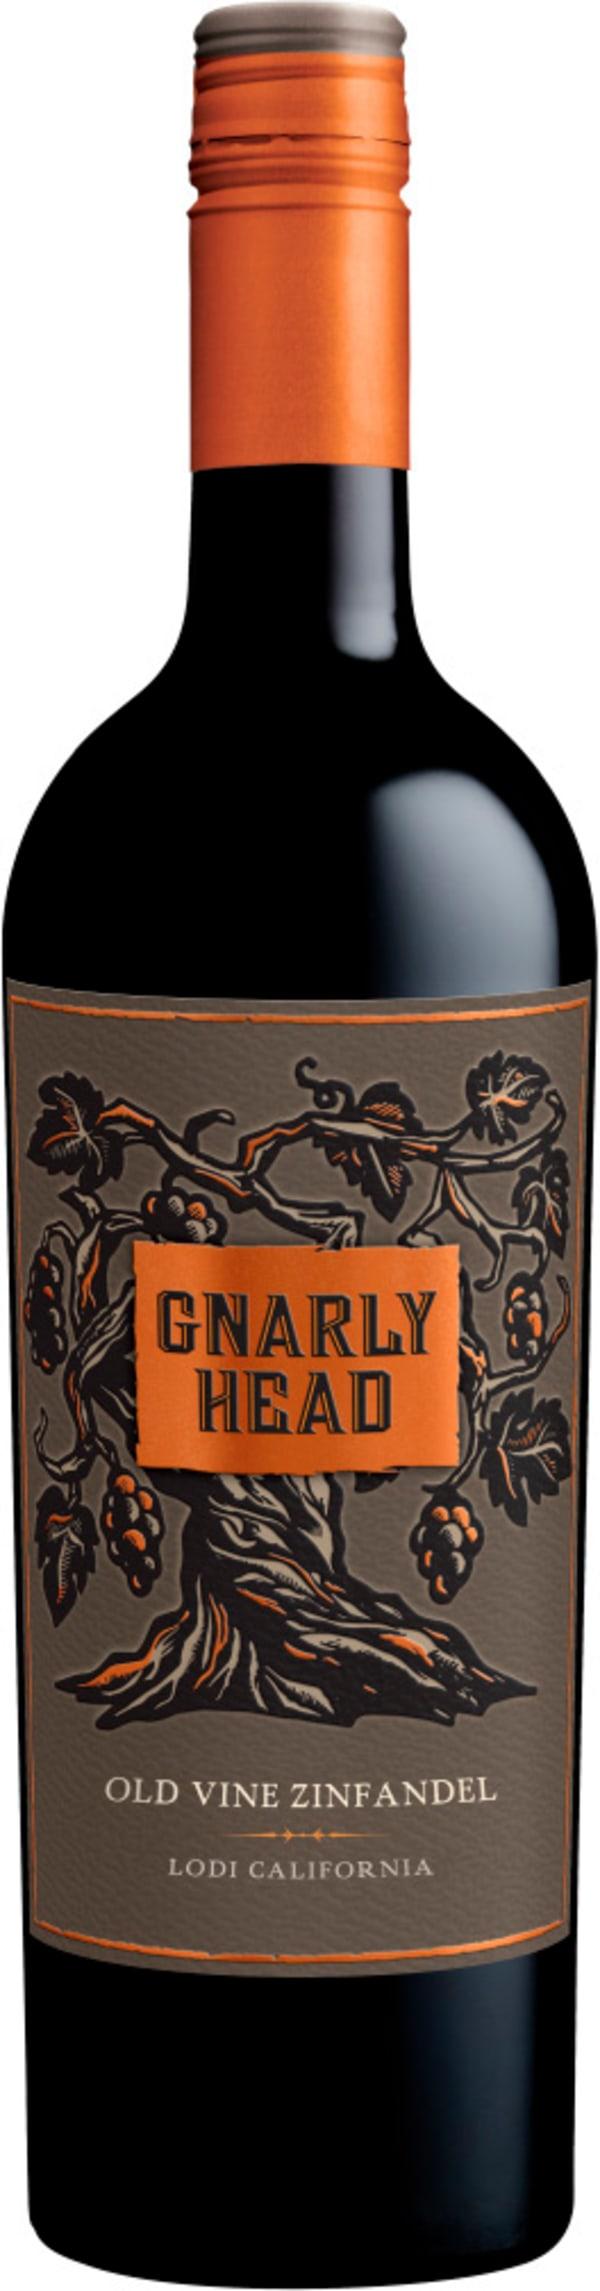 Gnarly Head Old Vine Zin 2016